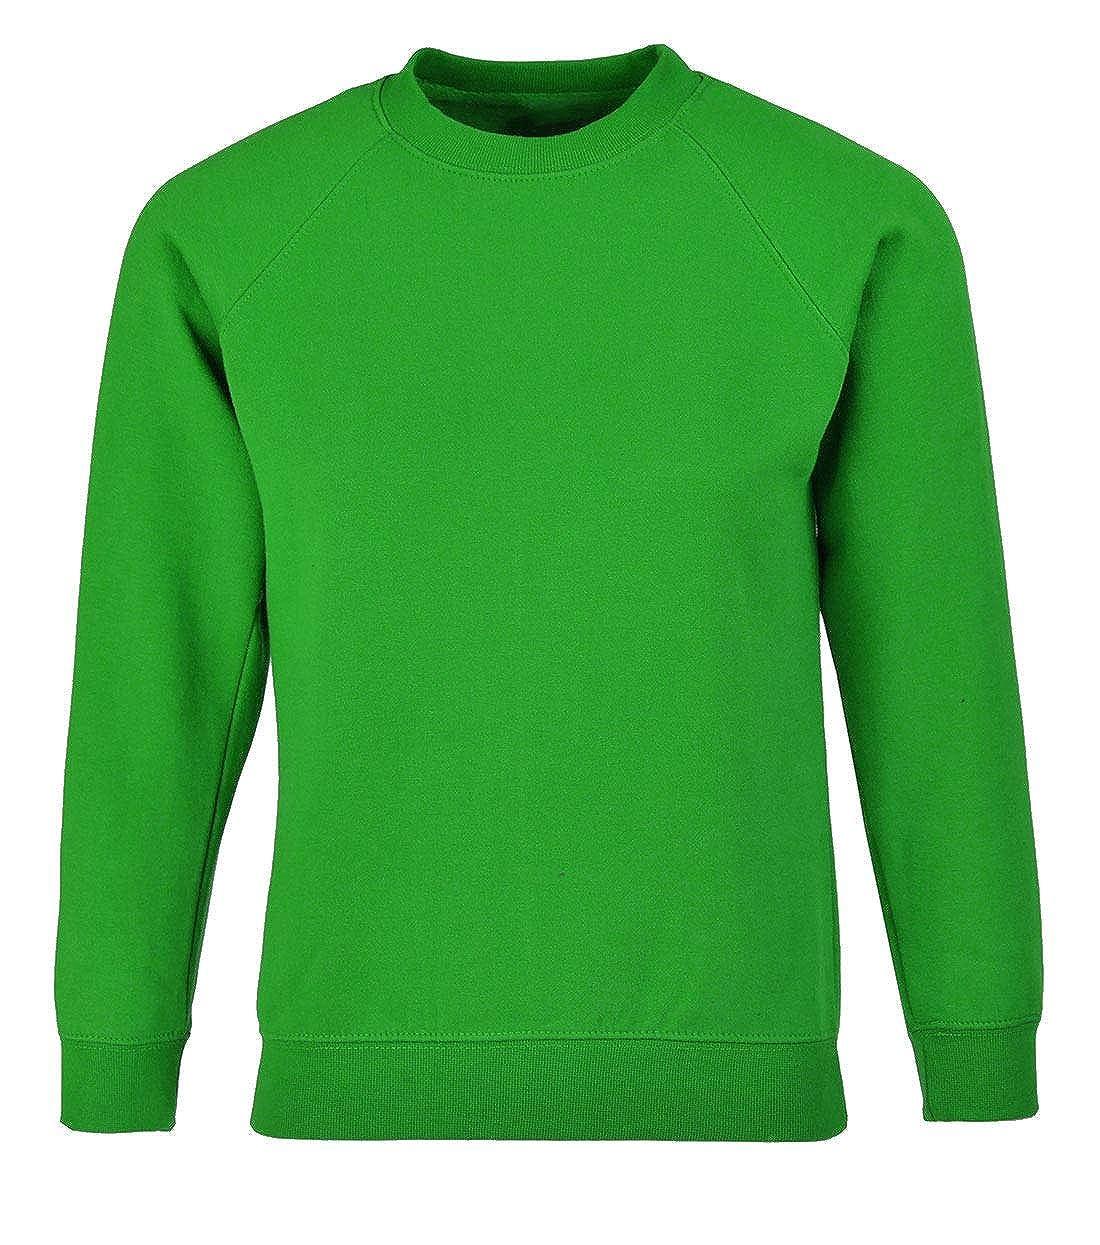 My Choice Stuff Boys Long Sleeve School Wear Uniform Jumper Boys Crew Neck Plain Sweatshirt